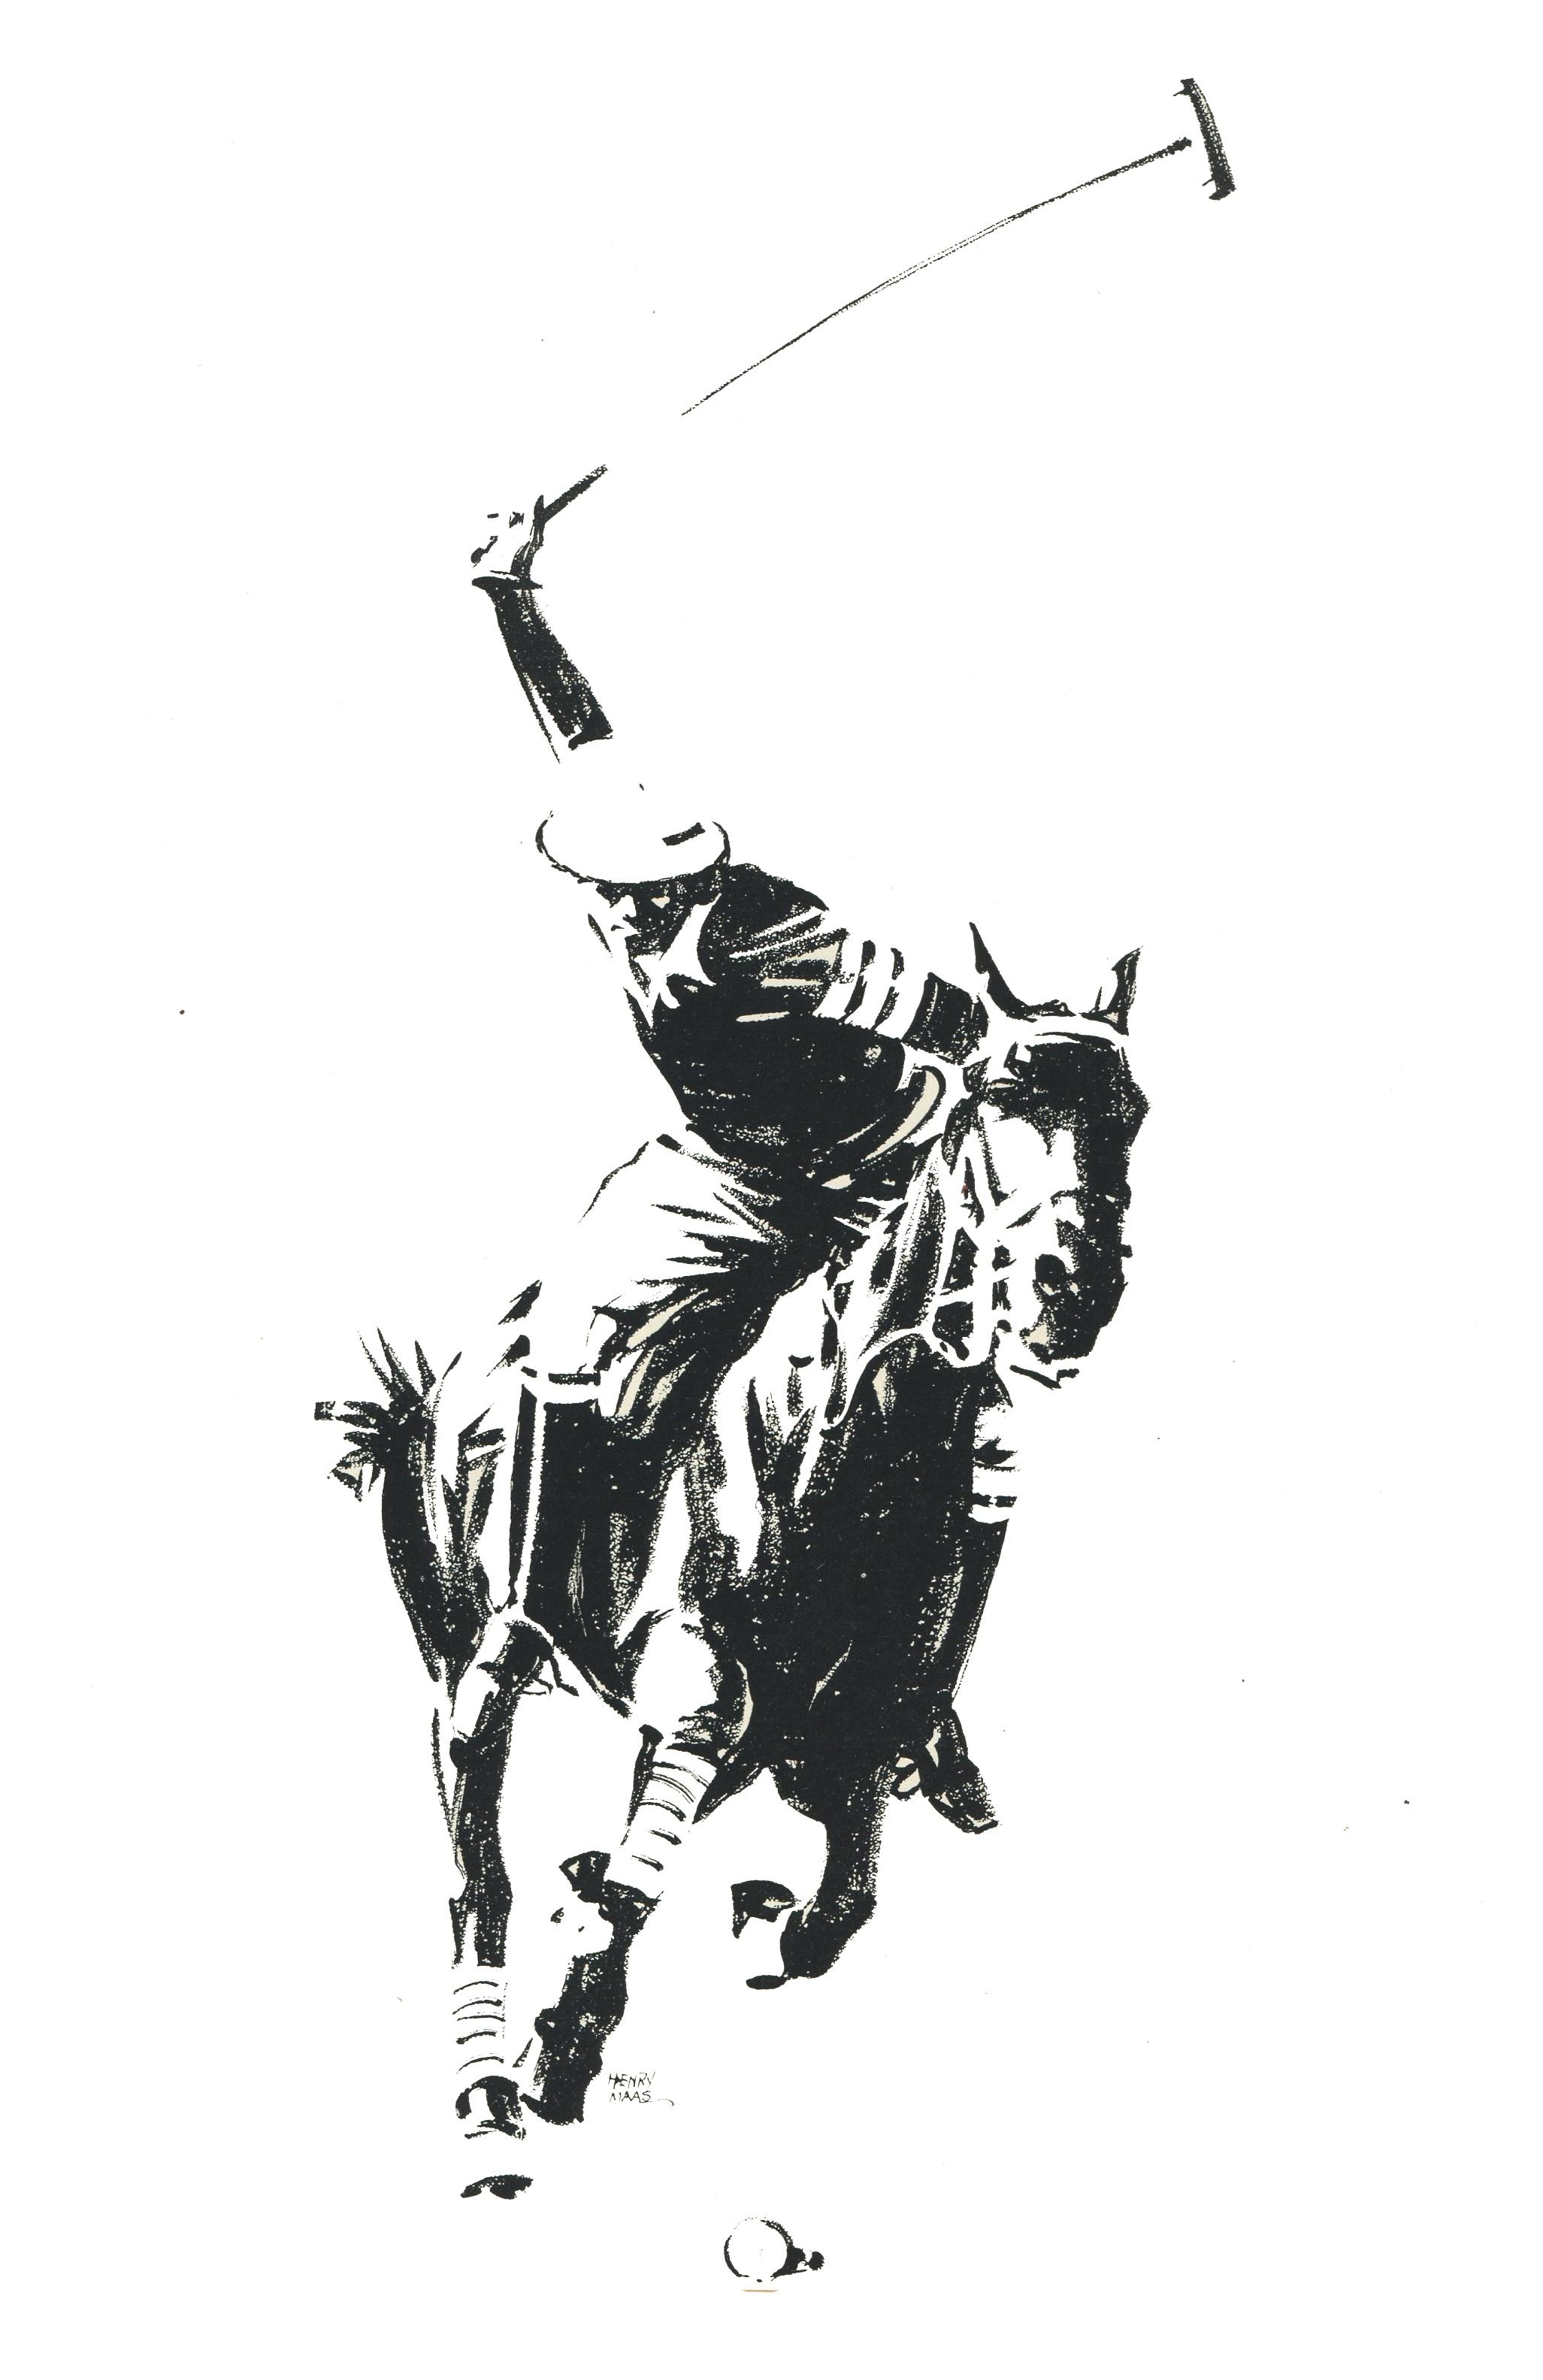 Polo Logo Wallpaper - WallpaperSafari